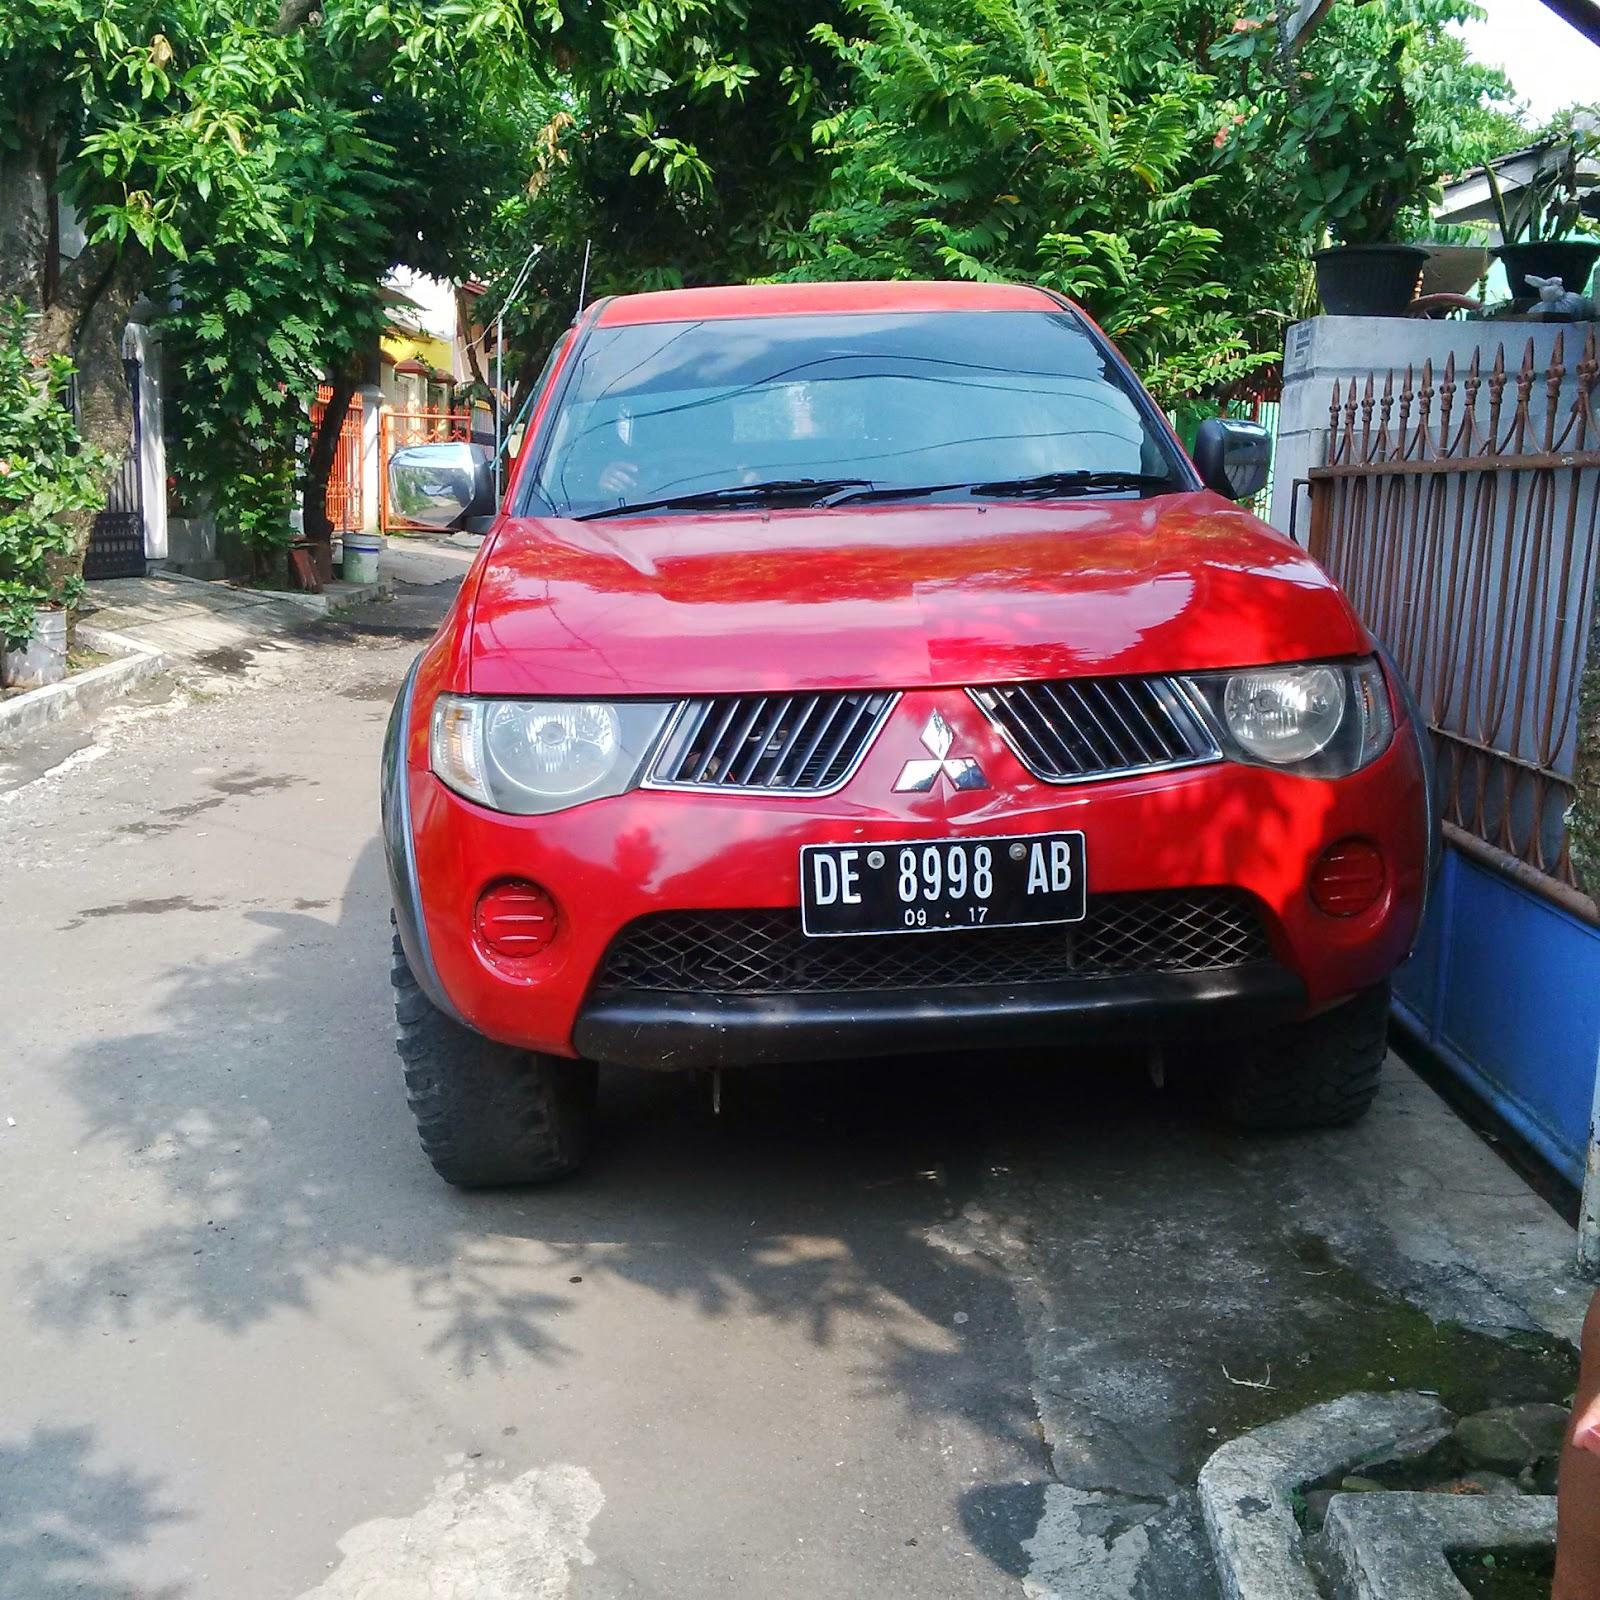 Pengiriman Mitsubishi Strada DE 8998 AB Lampung ke Makassar